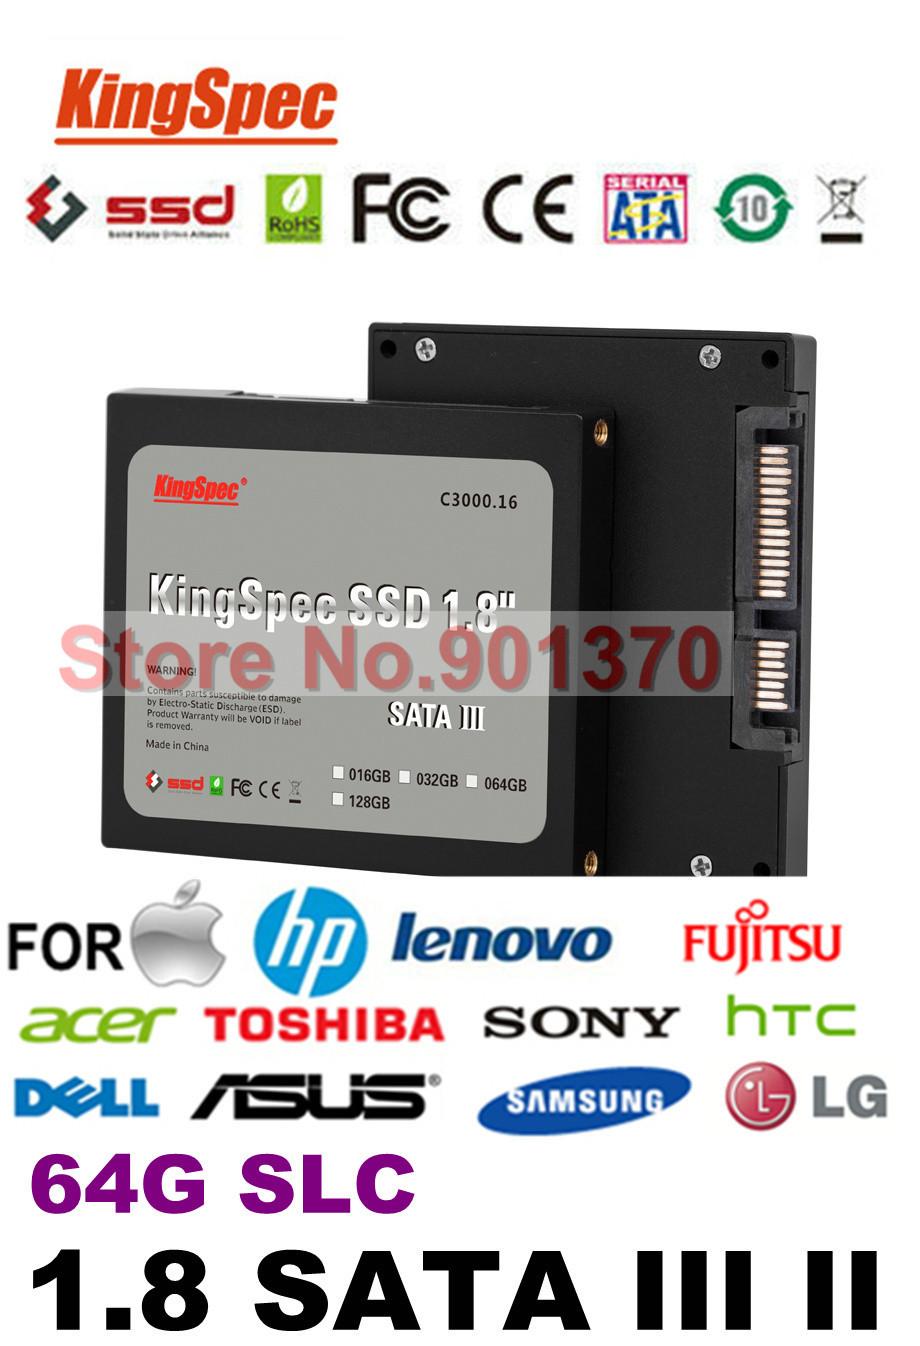 "Kingspec SSD 1.8"" SATA III SSD 64GB SATA II Solid State Drive Flash Drive SSD Hard Drive SLC 4-Channel ,CE FCC ROHS(China (Mainland))"